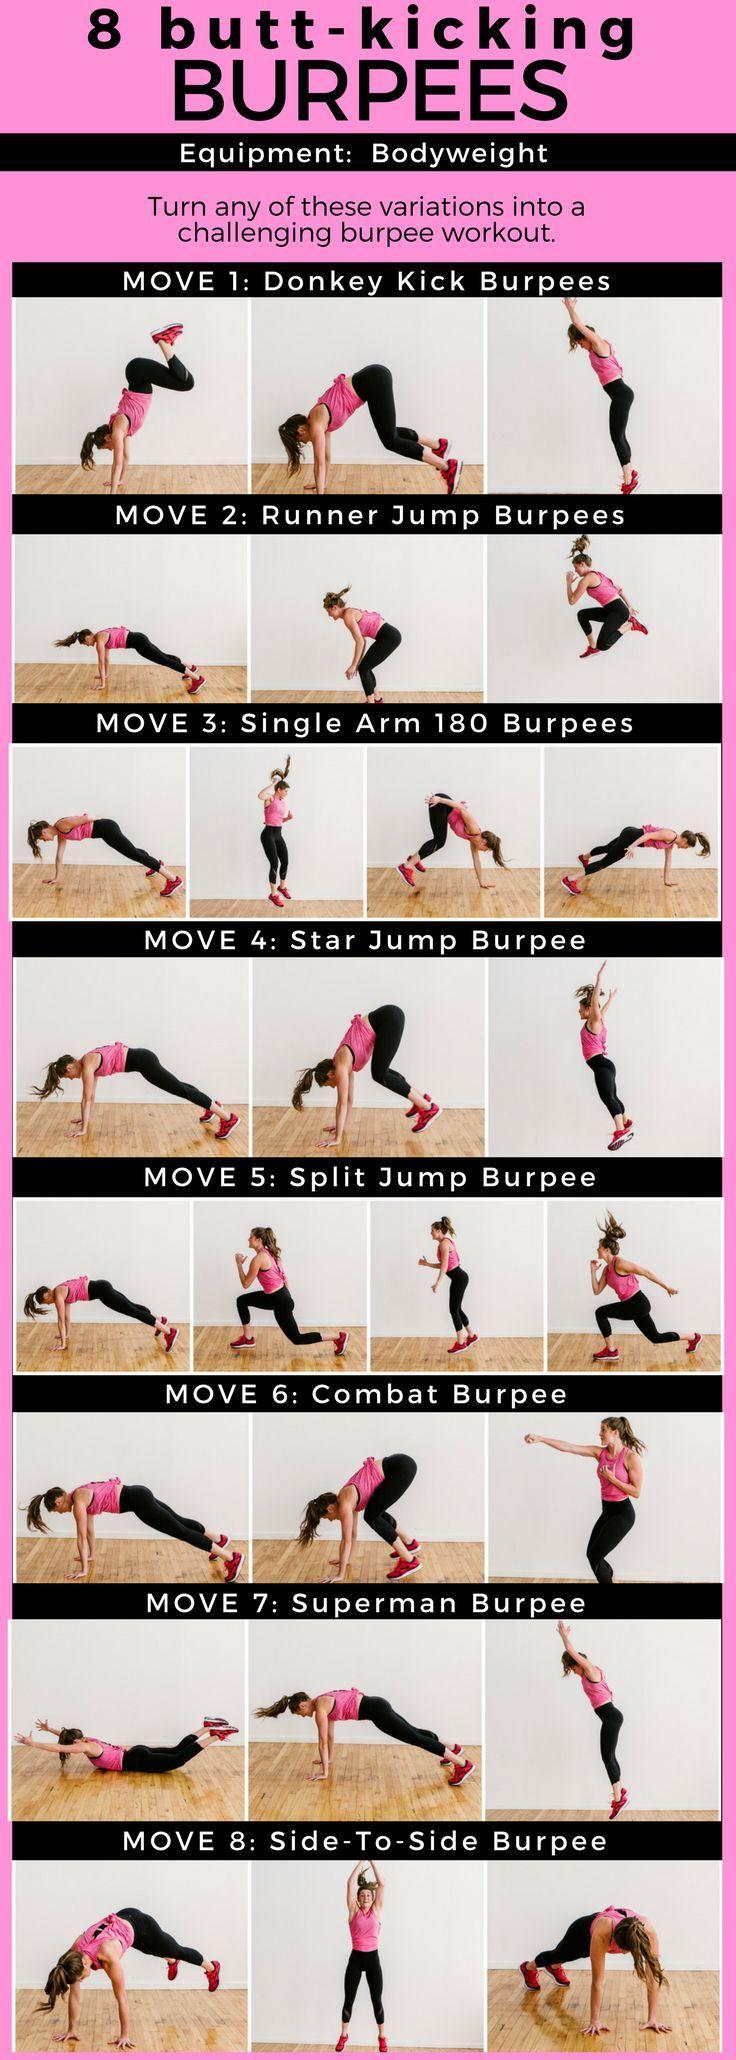 8 Butt-Kicking Burpees + 16 Minute EMOM Workout   burpees I burpees workout I burpee exercises I at home workout I total body workout II Nourish Move Love I #burpees I #athomeworkout I #fitmom